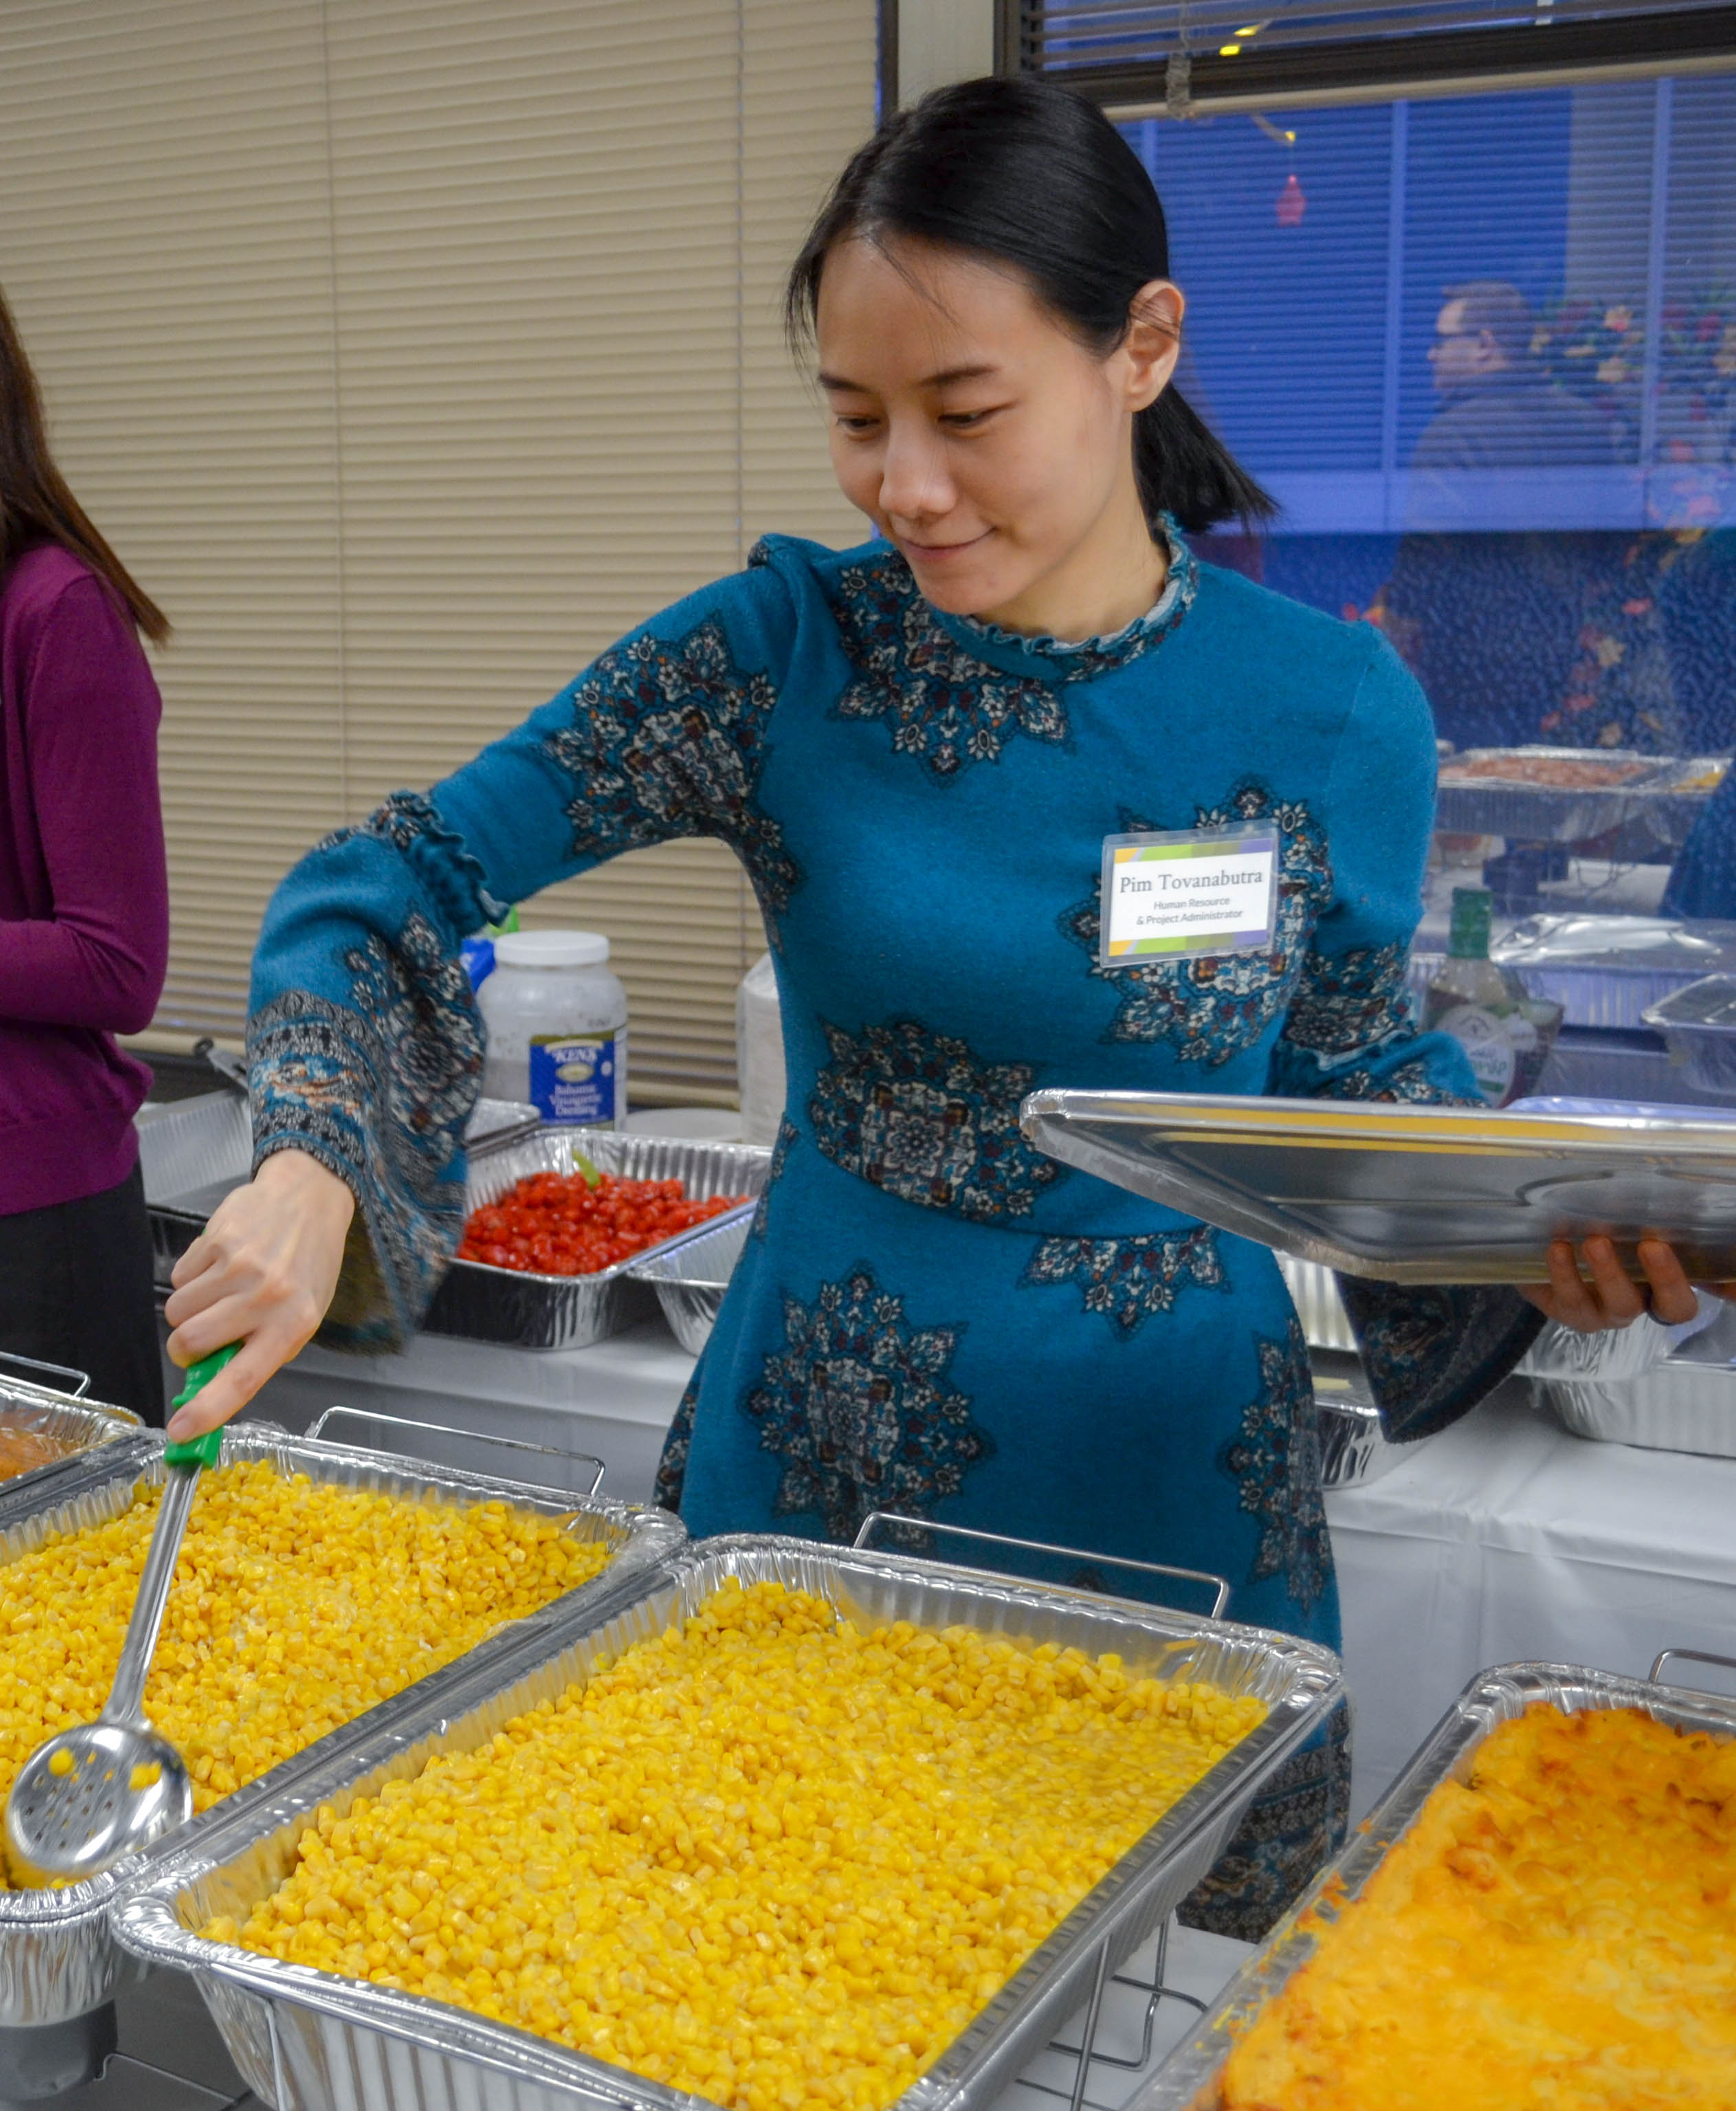 Staff member serves corn at DLS Thanksgiving celebration 2018